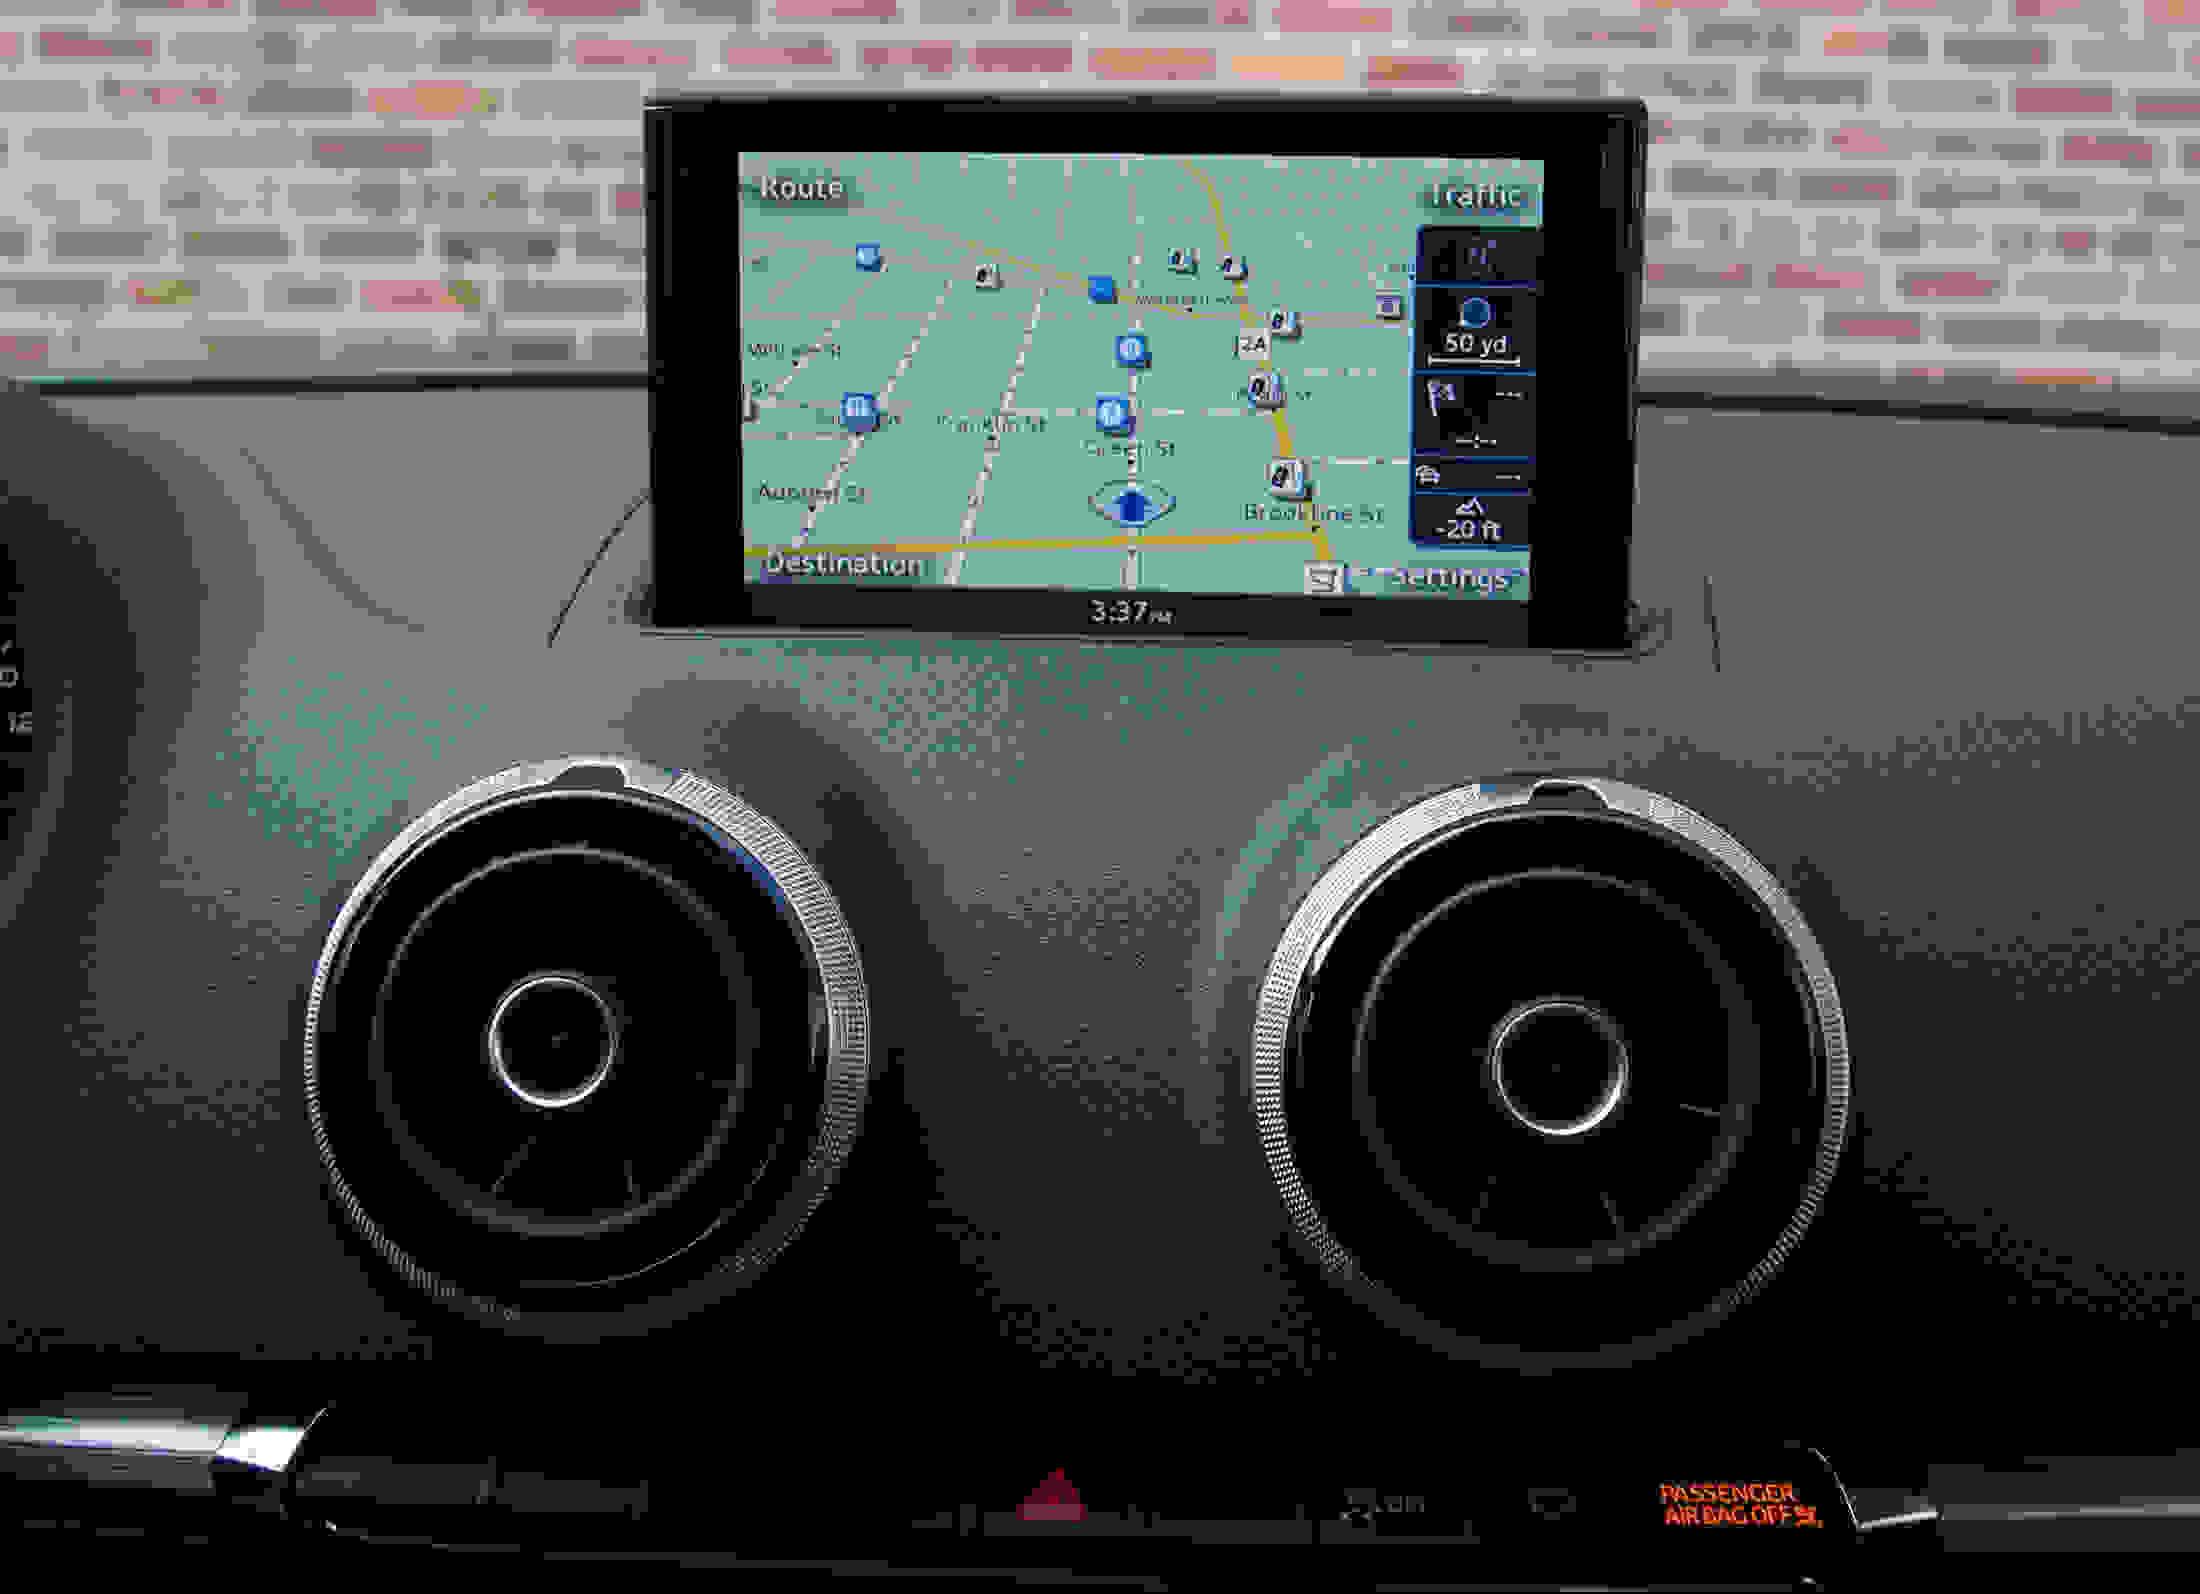 2015 audi a3 navigation screen